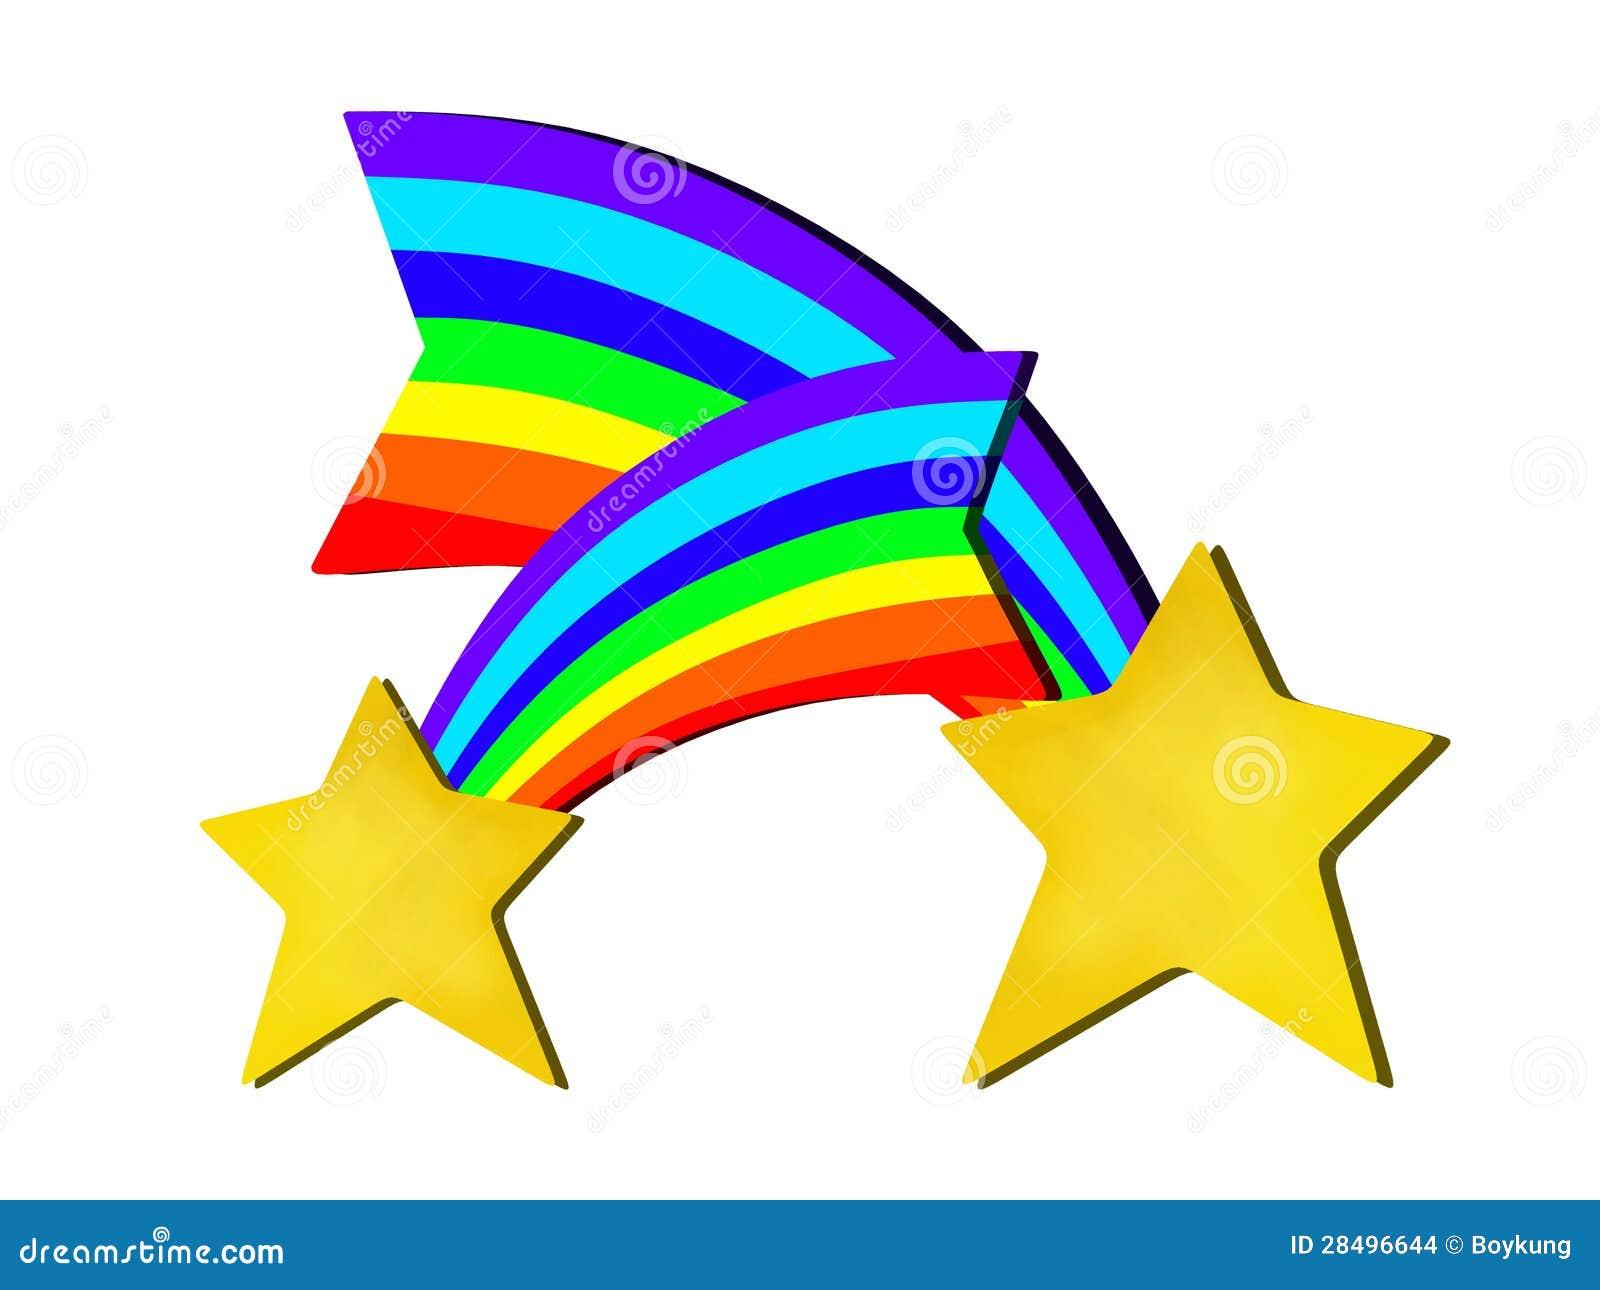 Abstrakte Regenbogen-Stern-Auslegung